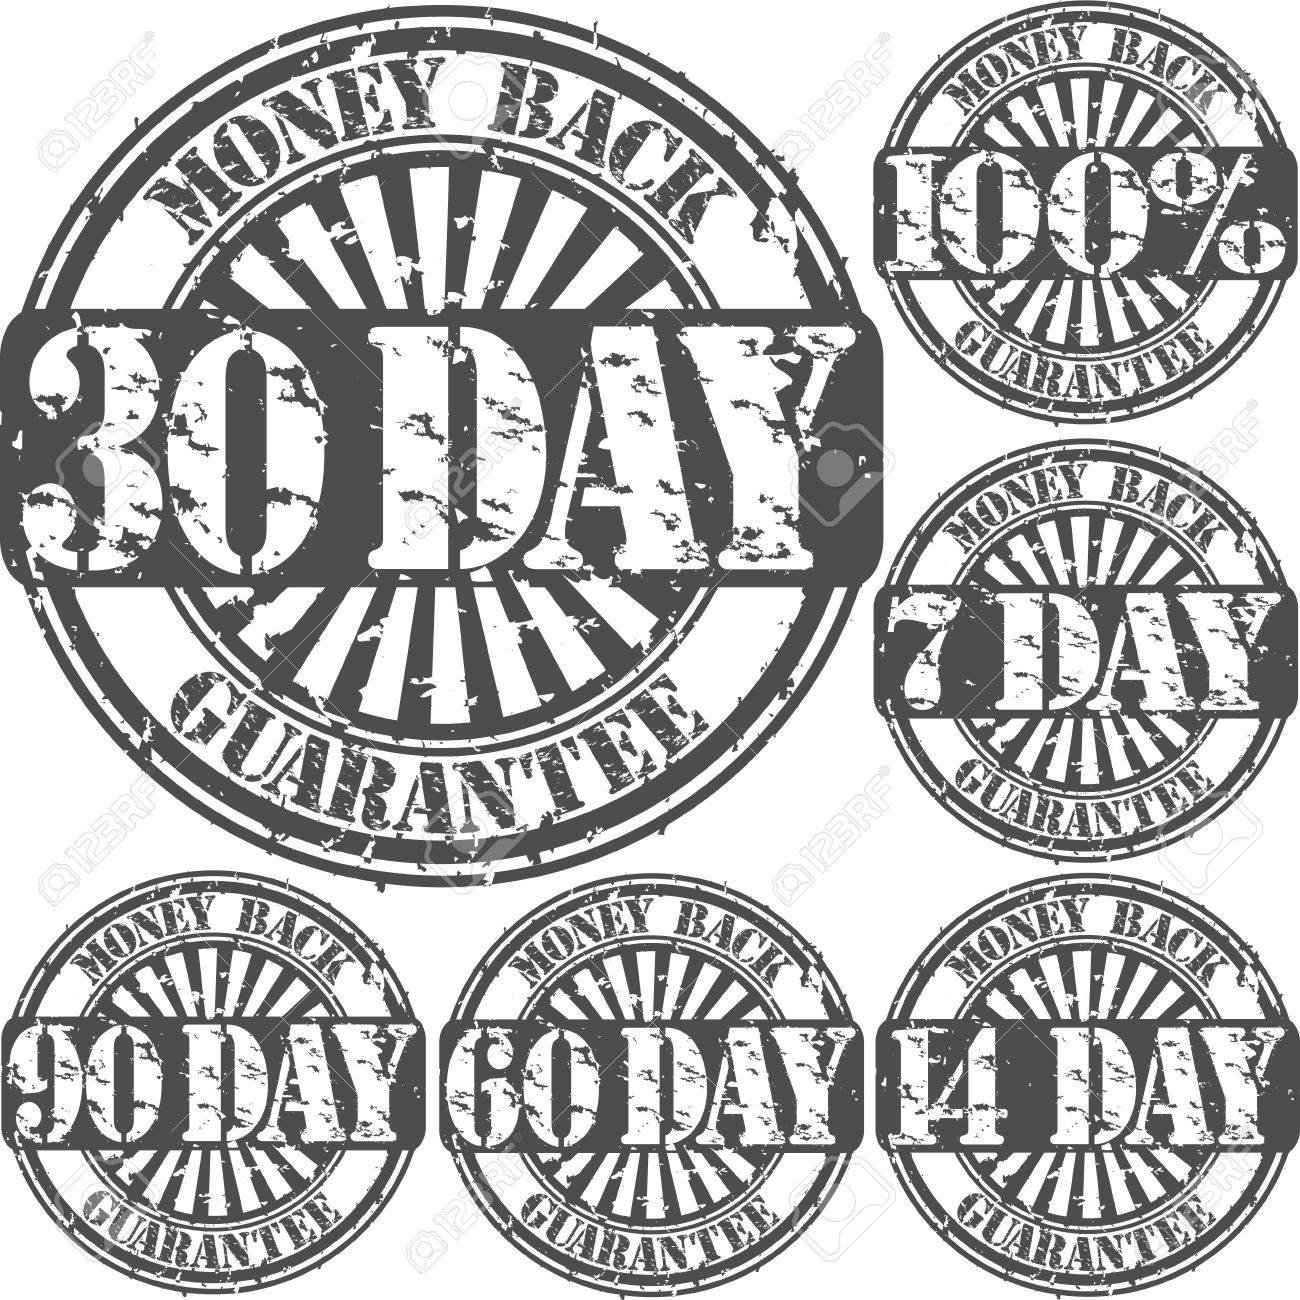 Grunge money back guarantee rubber stamp set Stock Vector - 15656500